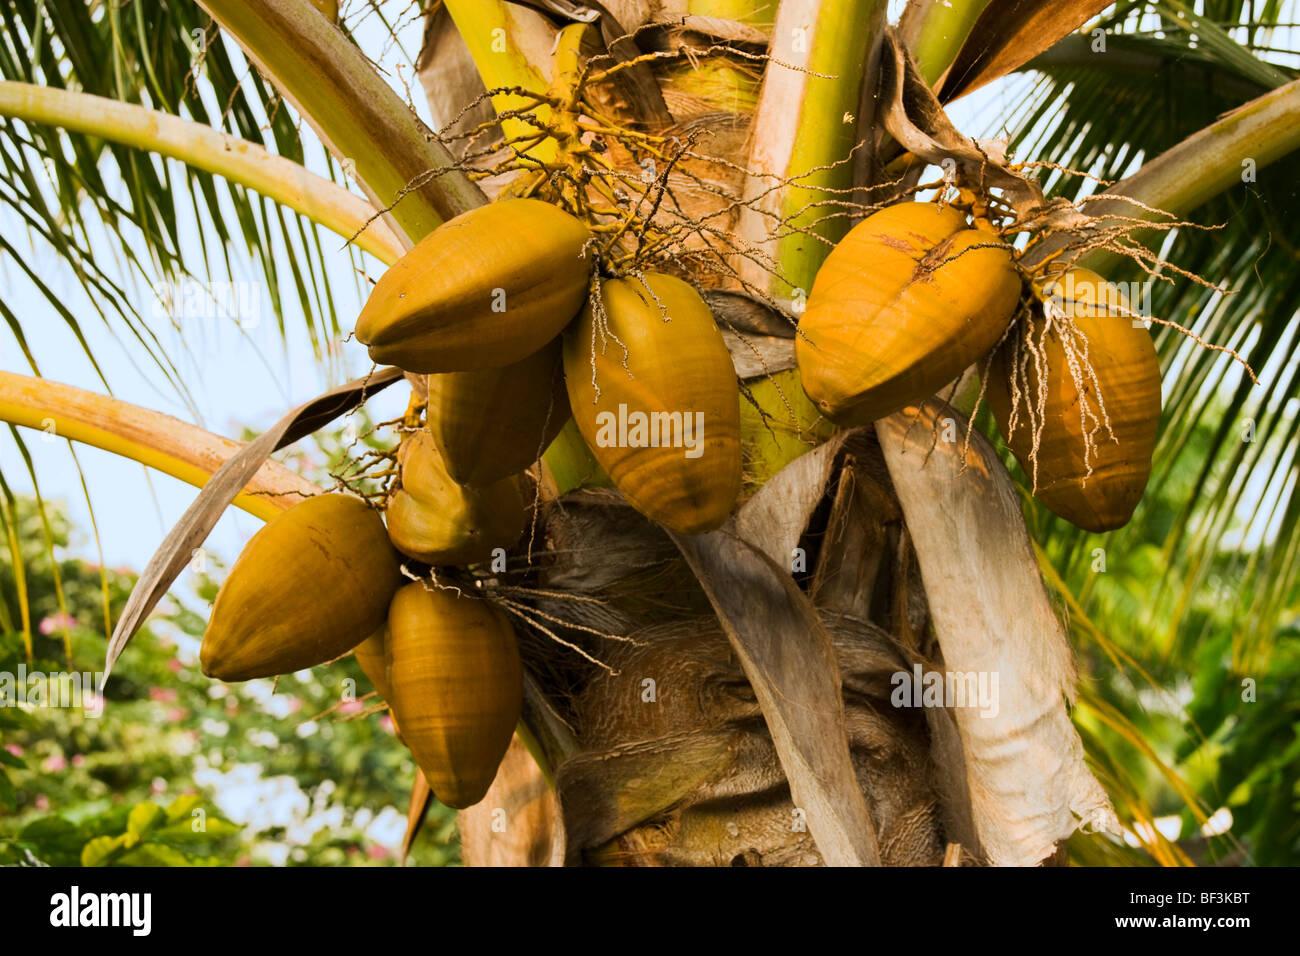 Agriculture - Mature coconuts (Cocos nucifera) on a coconut palm tree / Kona, Hawaii, USA. Stock Photo